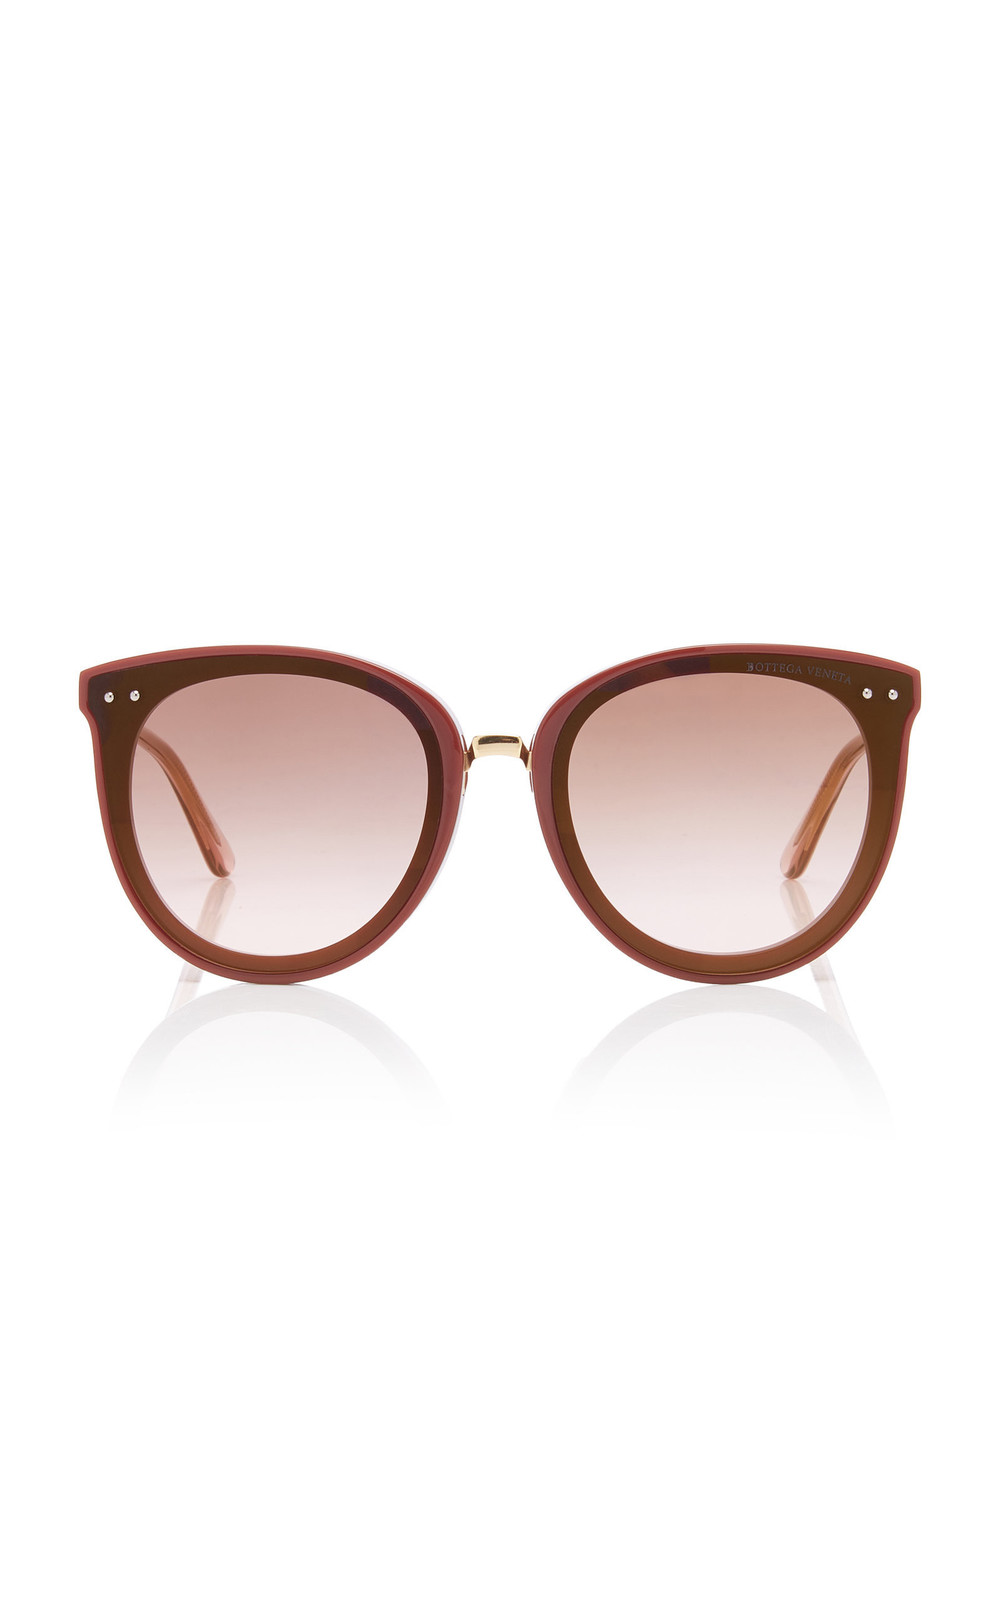 Bottega Veneta Sunglasses Acetate Cat-Eye Sunglasses in pink